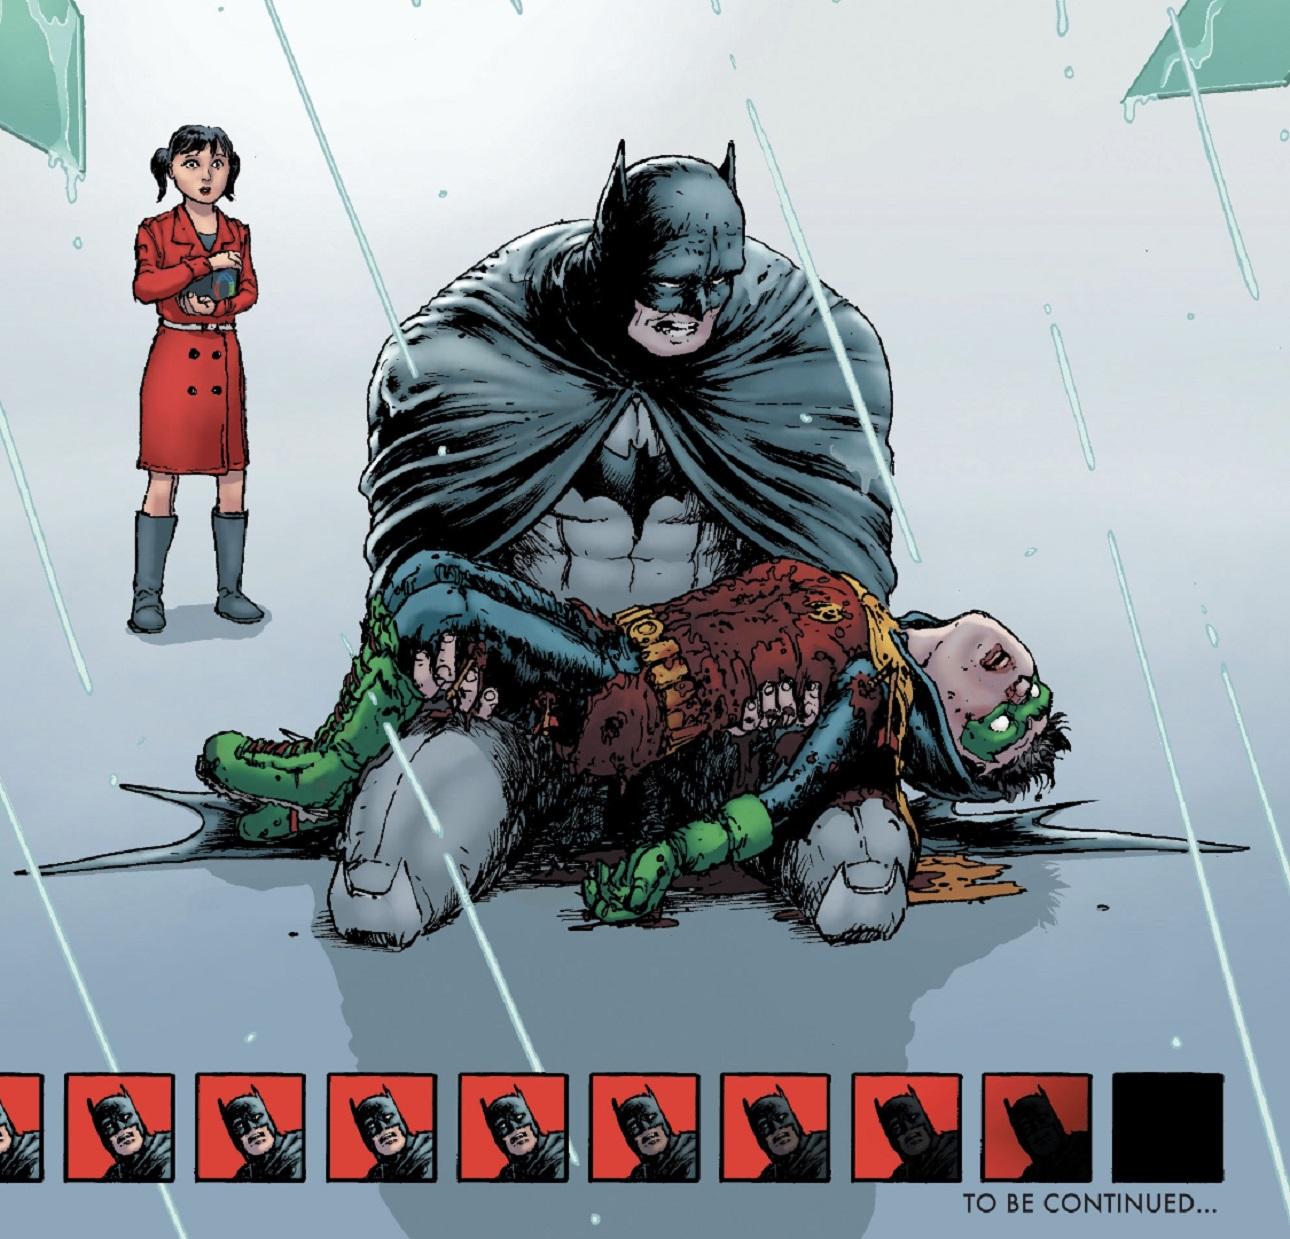 robin-damian-wayne-death.jpg